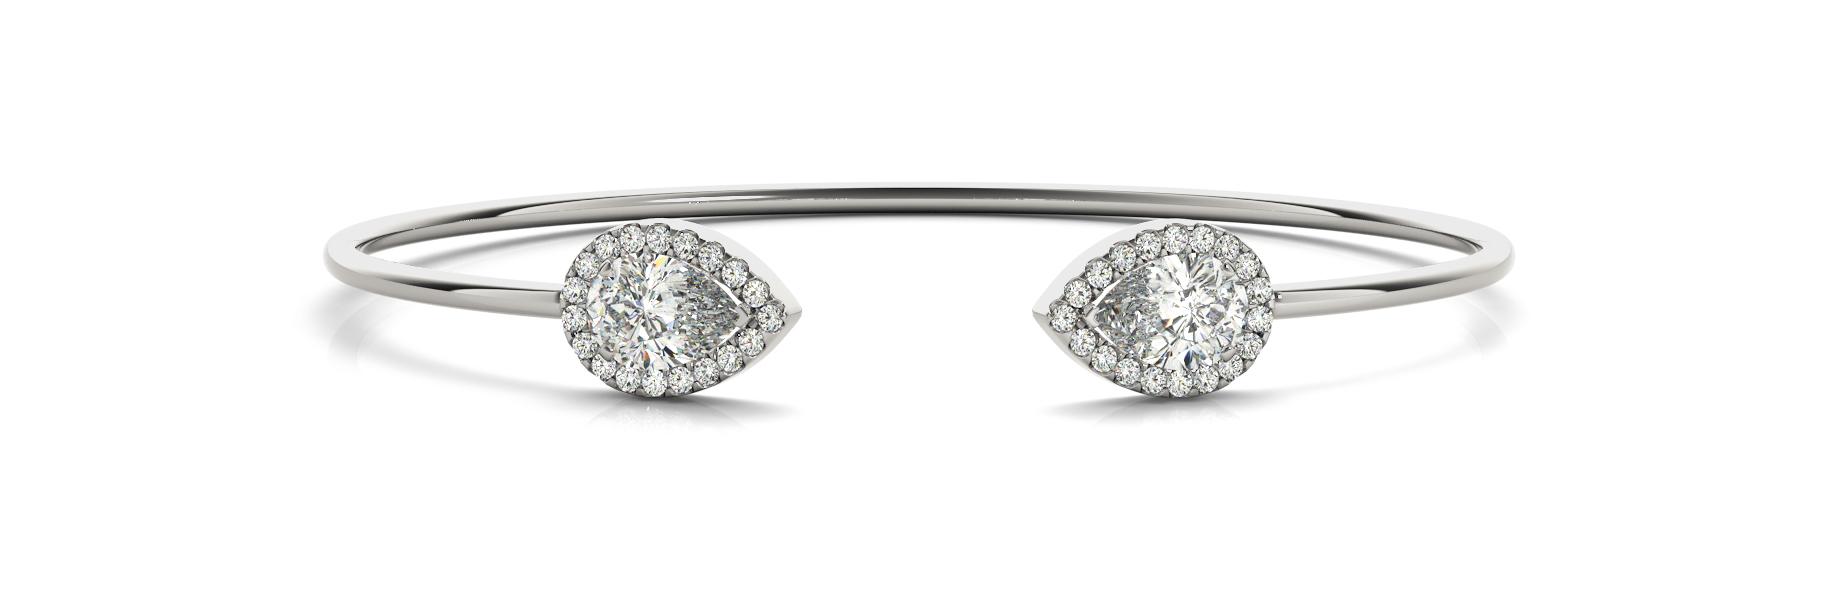 1 1/8 ct tw 14kt gold White Bracelet 2 - 7X5 Pear ,40 - .006PT Round